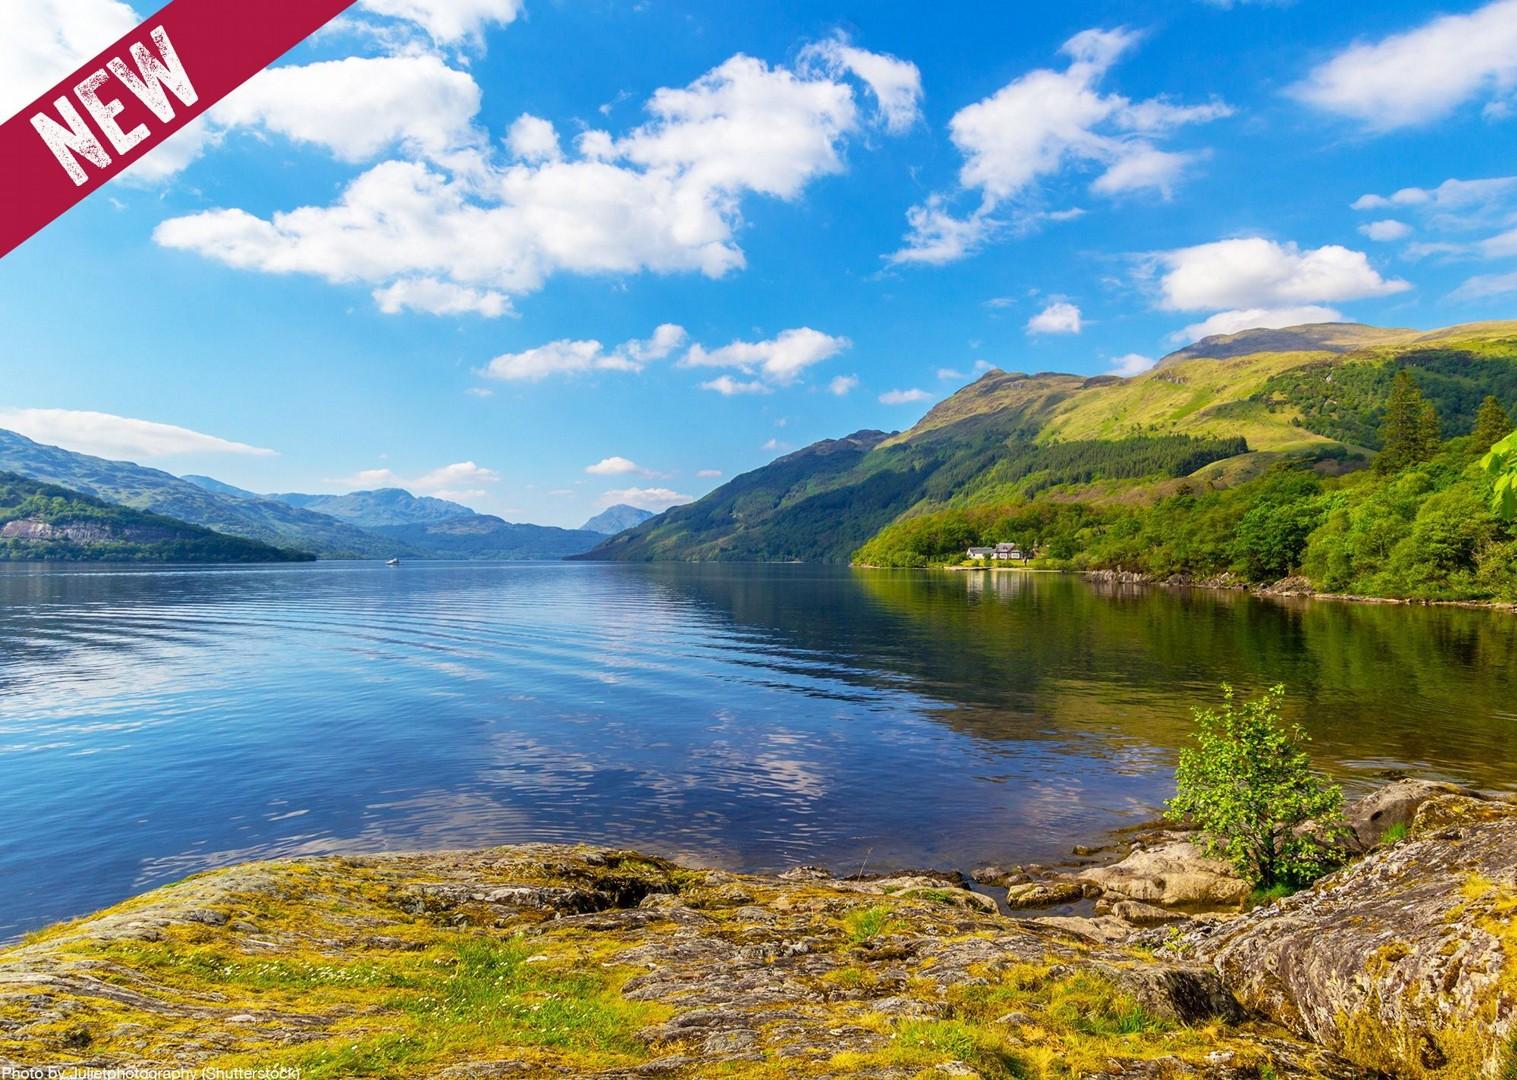 loch-lomond-scotland-uk-cycling-holiday-fun-lake.jpg - NEW! UK - Scotland - Lochs and Glens - Guided Leisure Cycling Holiday - Leisure Cycling